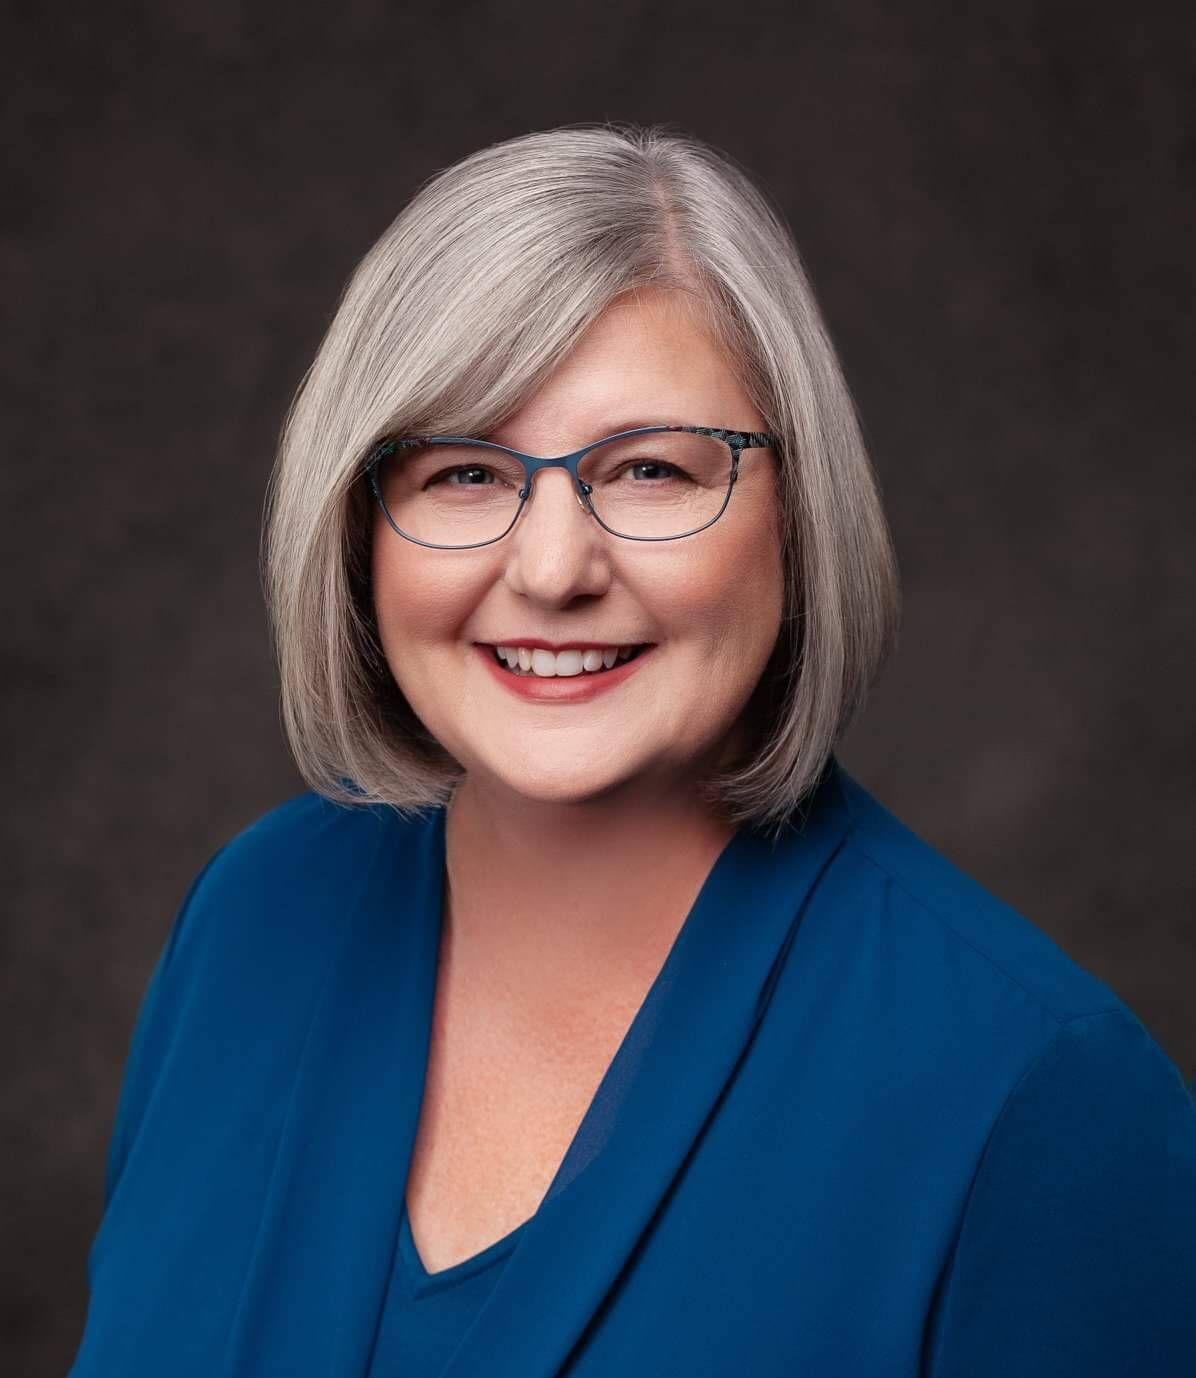 Dr. Lori A. Heyler